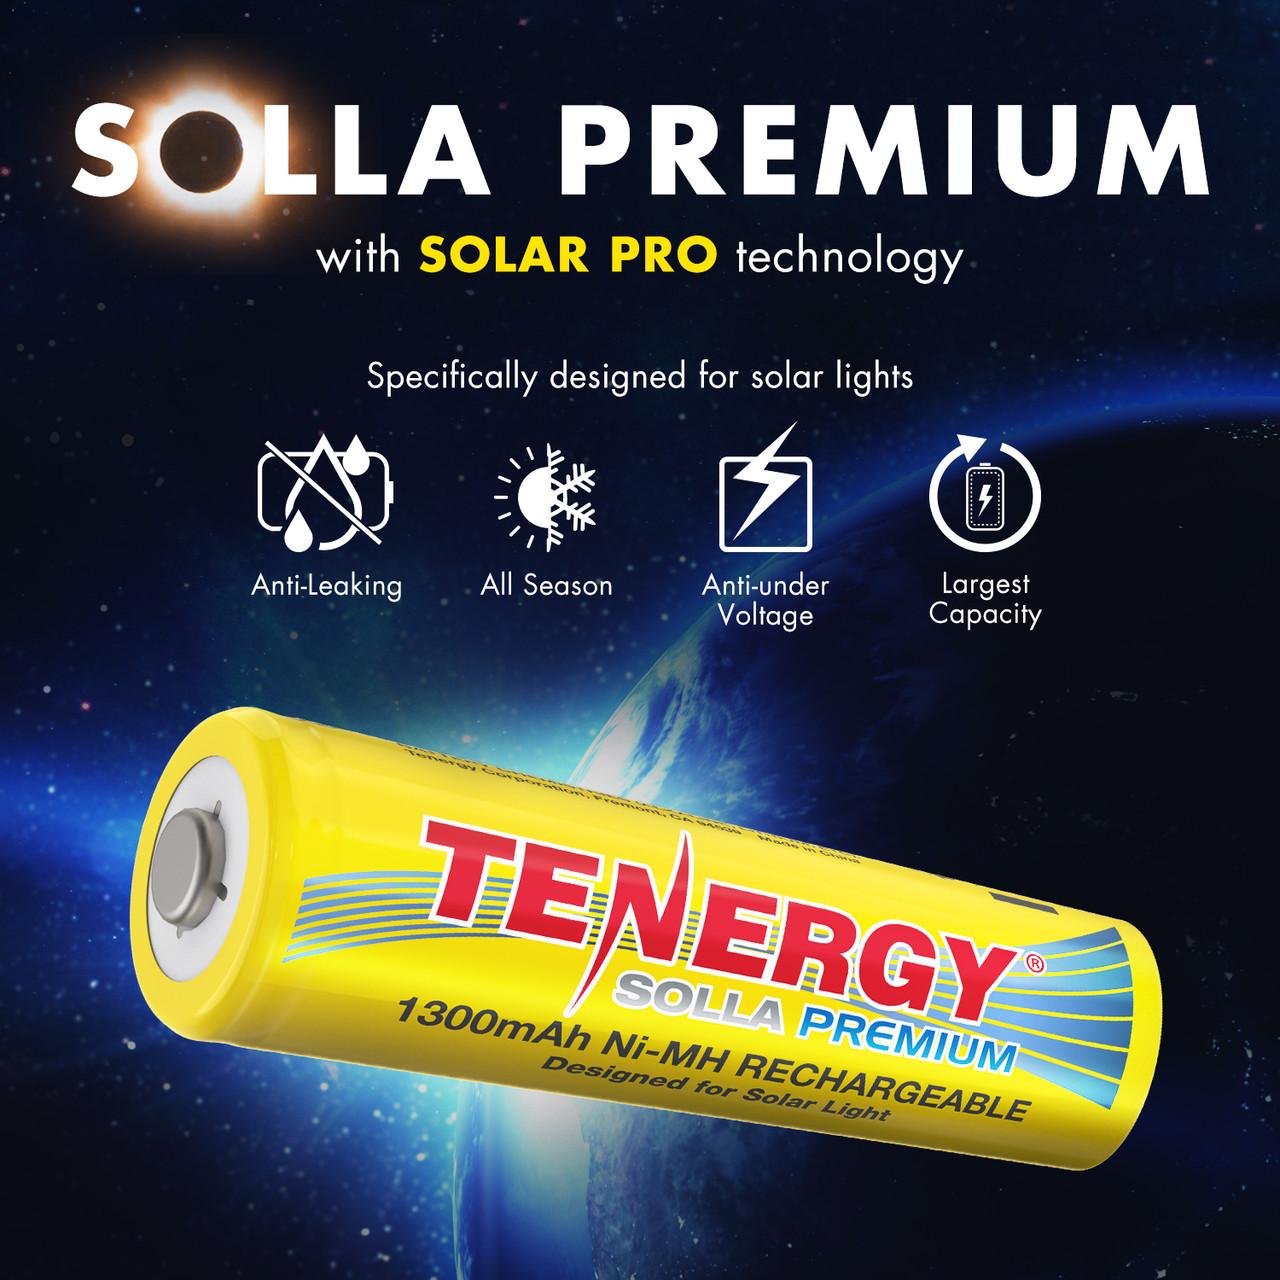 Tenergy Solla Premium Rechargeable NiMH AA Battery, 1300mAh Solar Batteries for Solar Garden Lights, 20 PCS, UL Certified